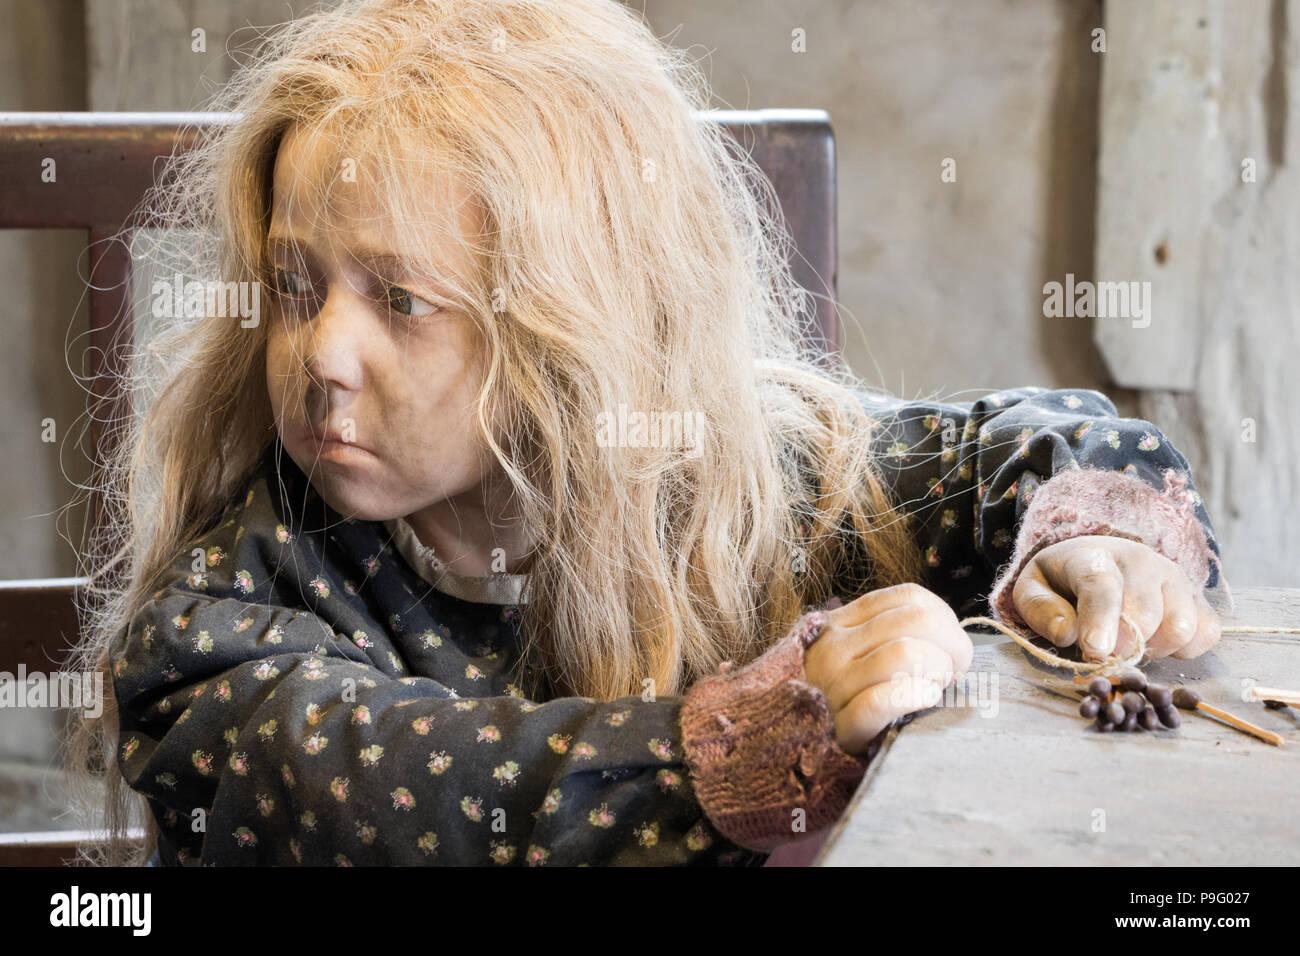 Medieval poor young girl in open air museum Den Gamle By in Aarhus - Stock Image